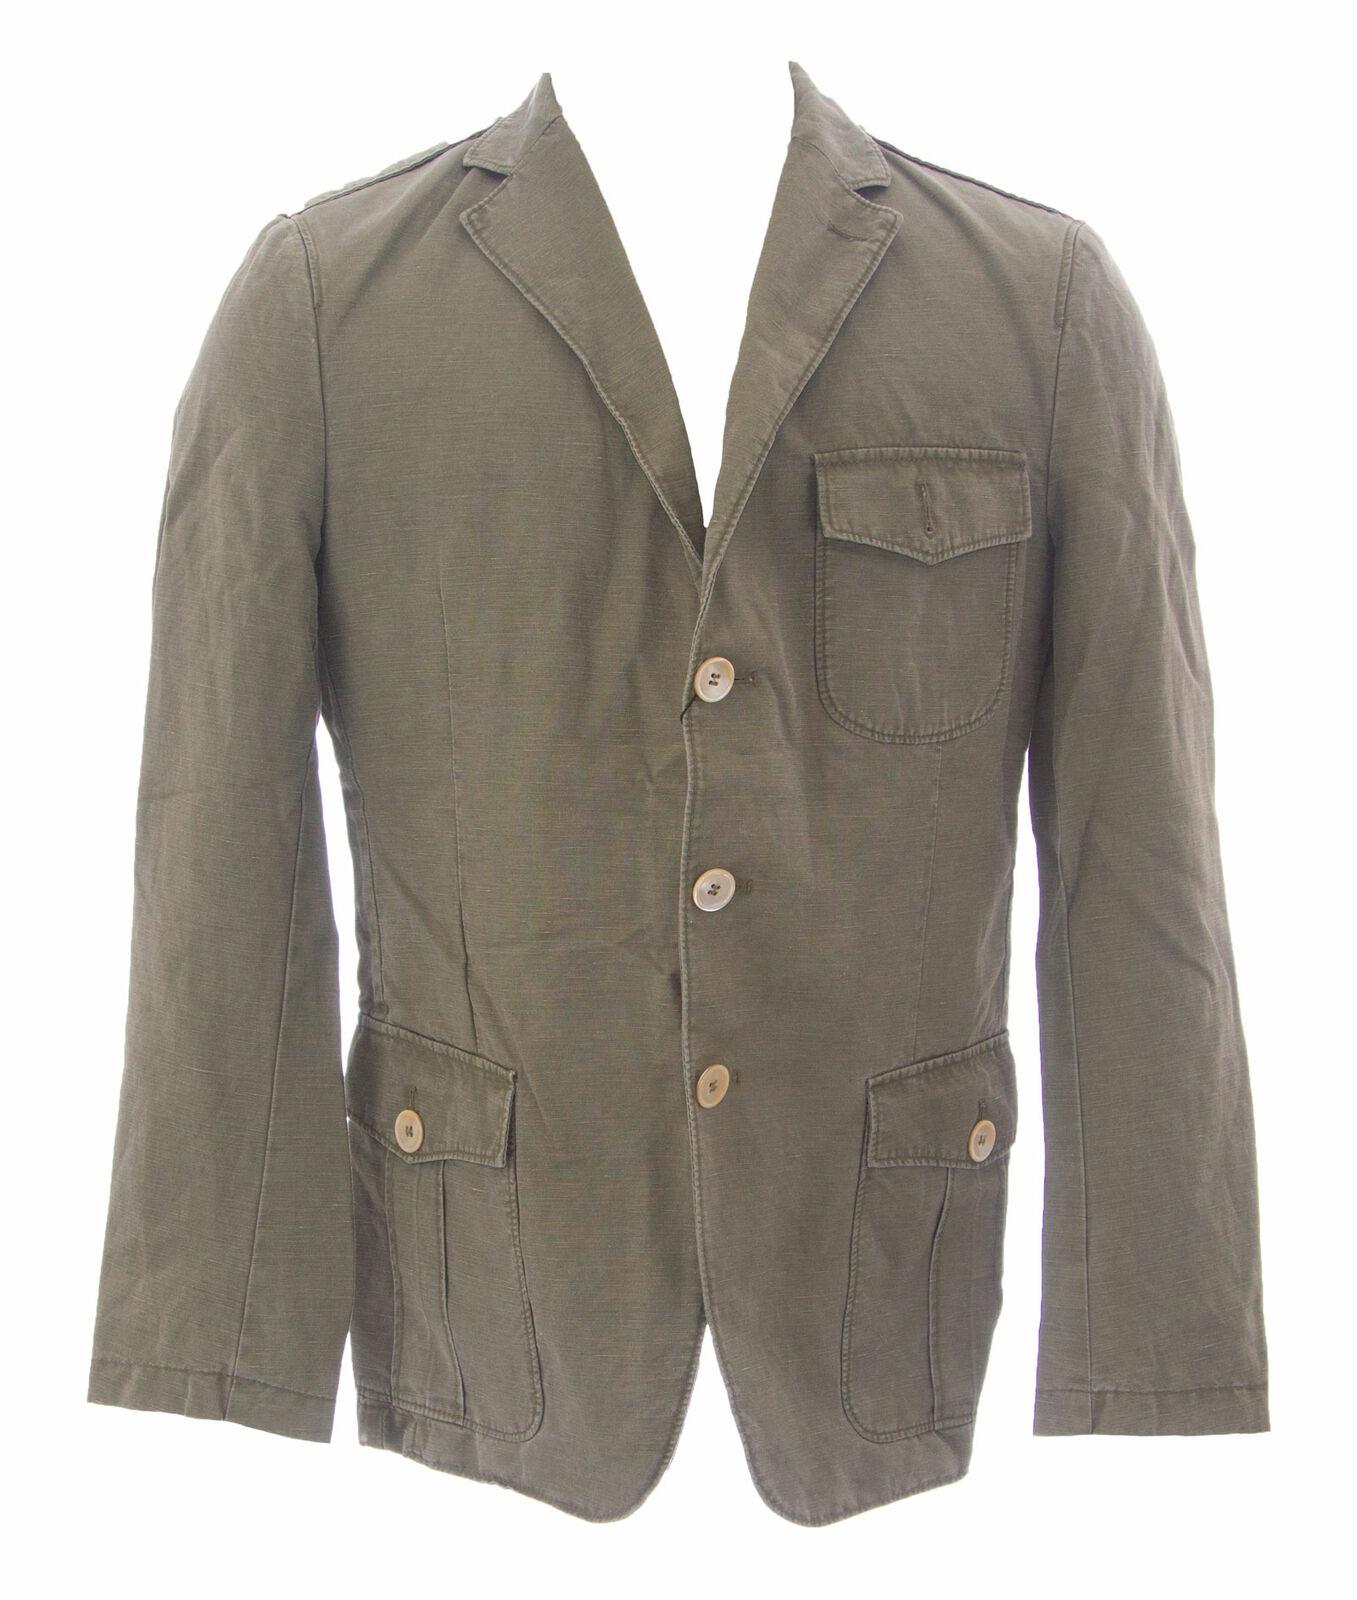 Gant Men's Olive Green Three Button Utility Blazer 76706 Size 50  NEW